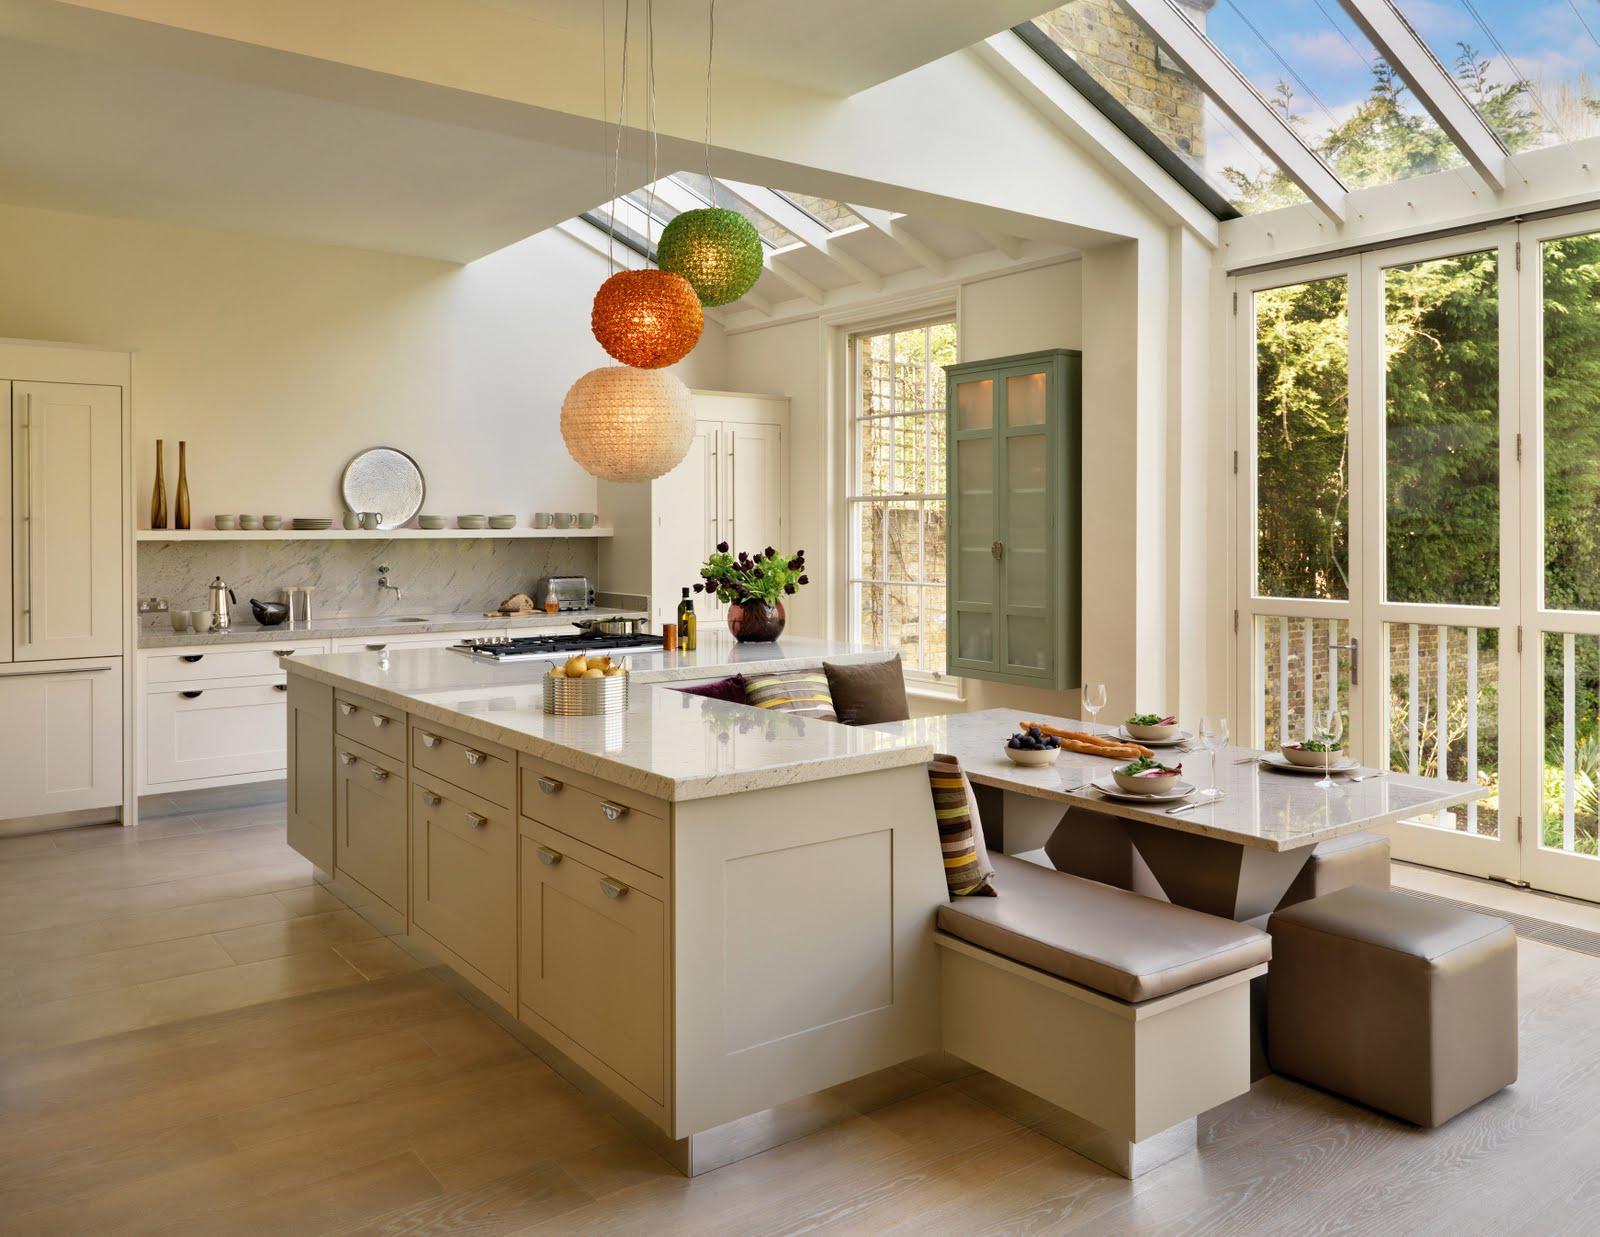 Portable kitchen island photo - 2